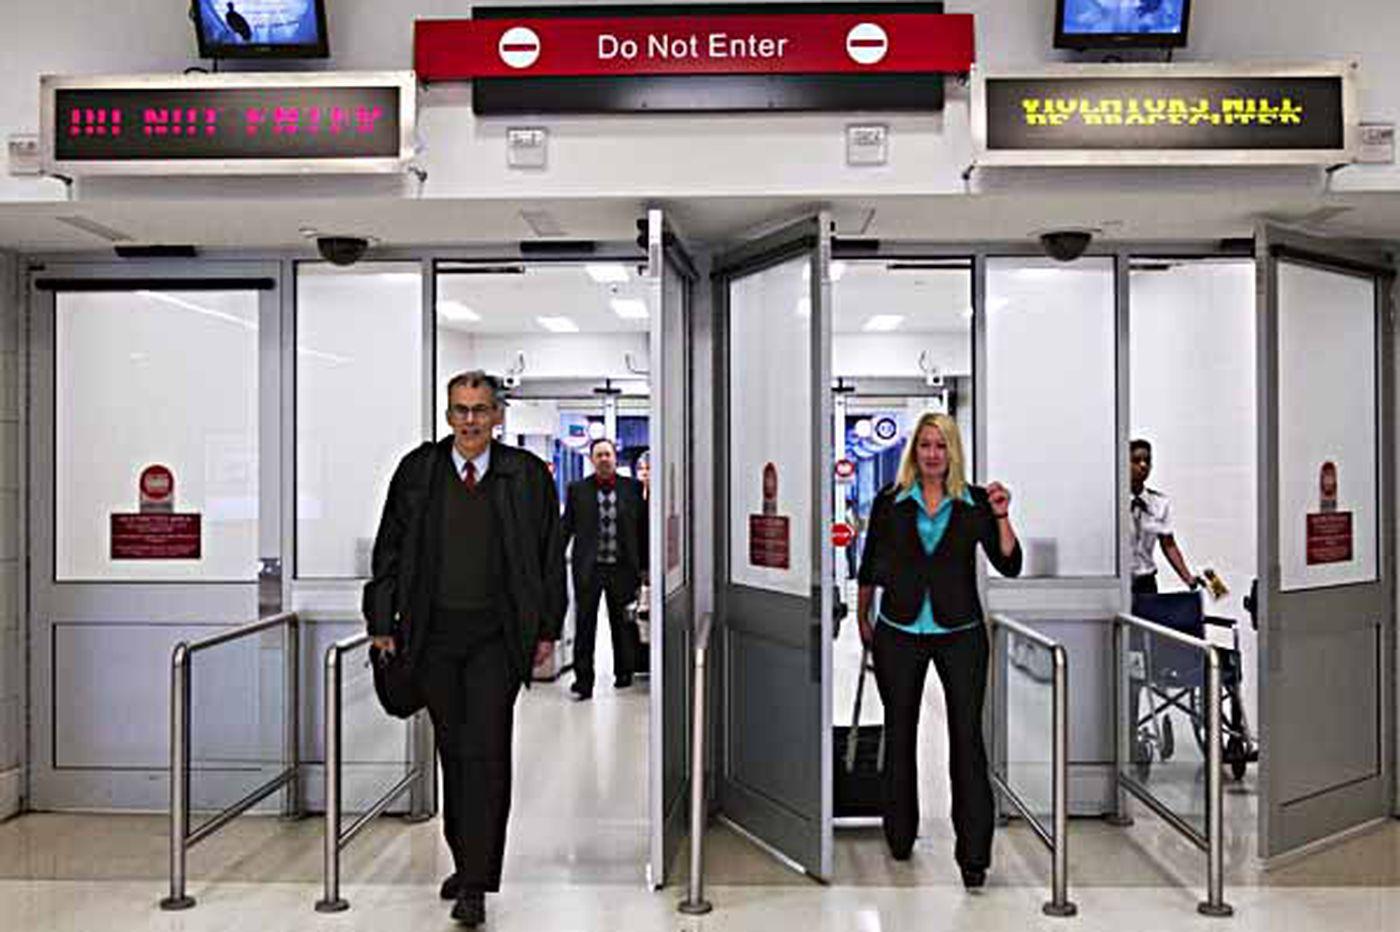 Airports sue TSA over who guards the exits